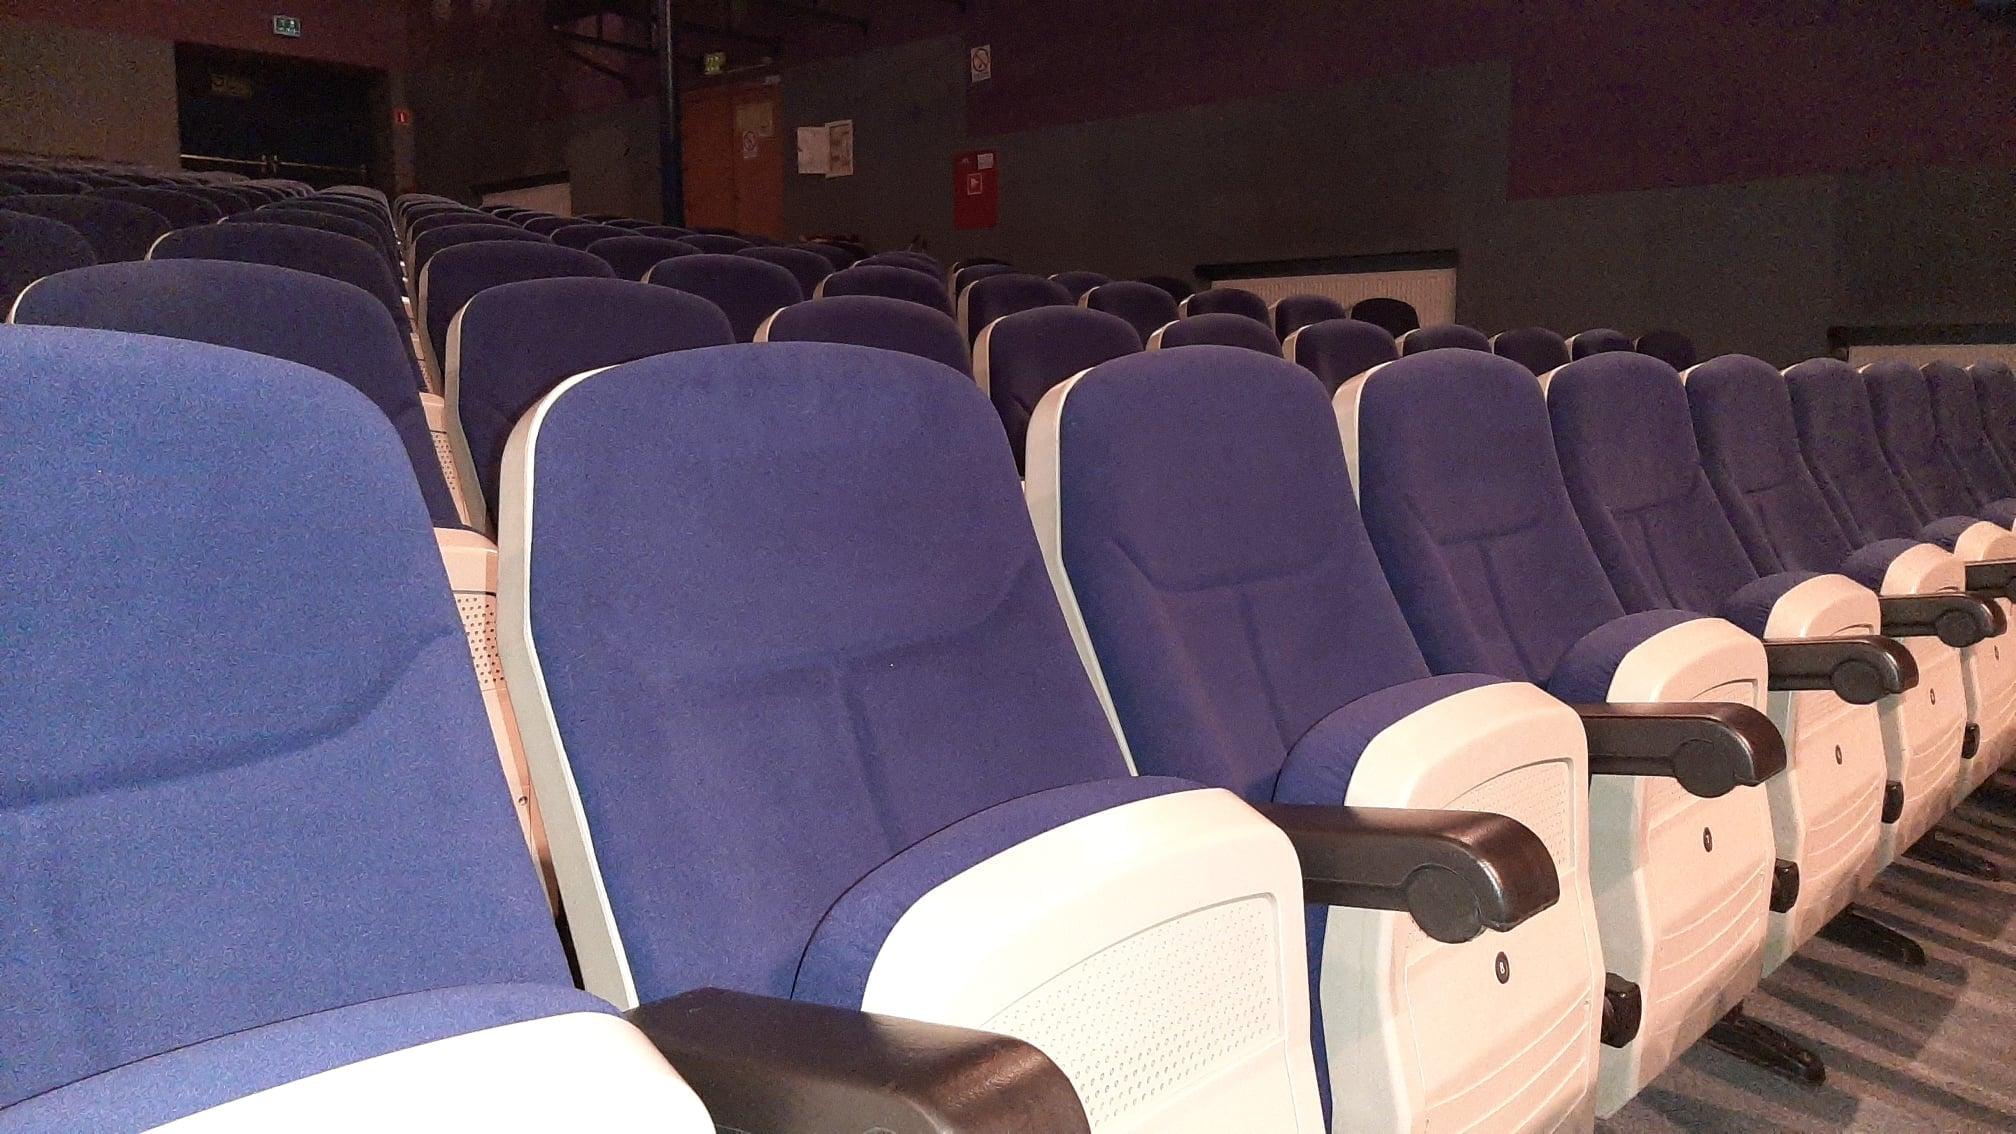 Kino Bałtyk